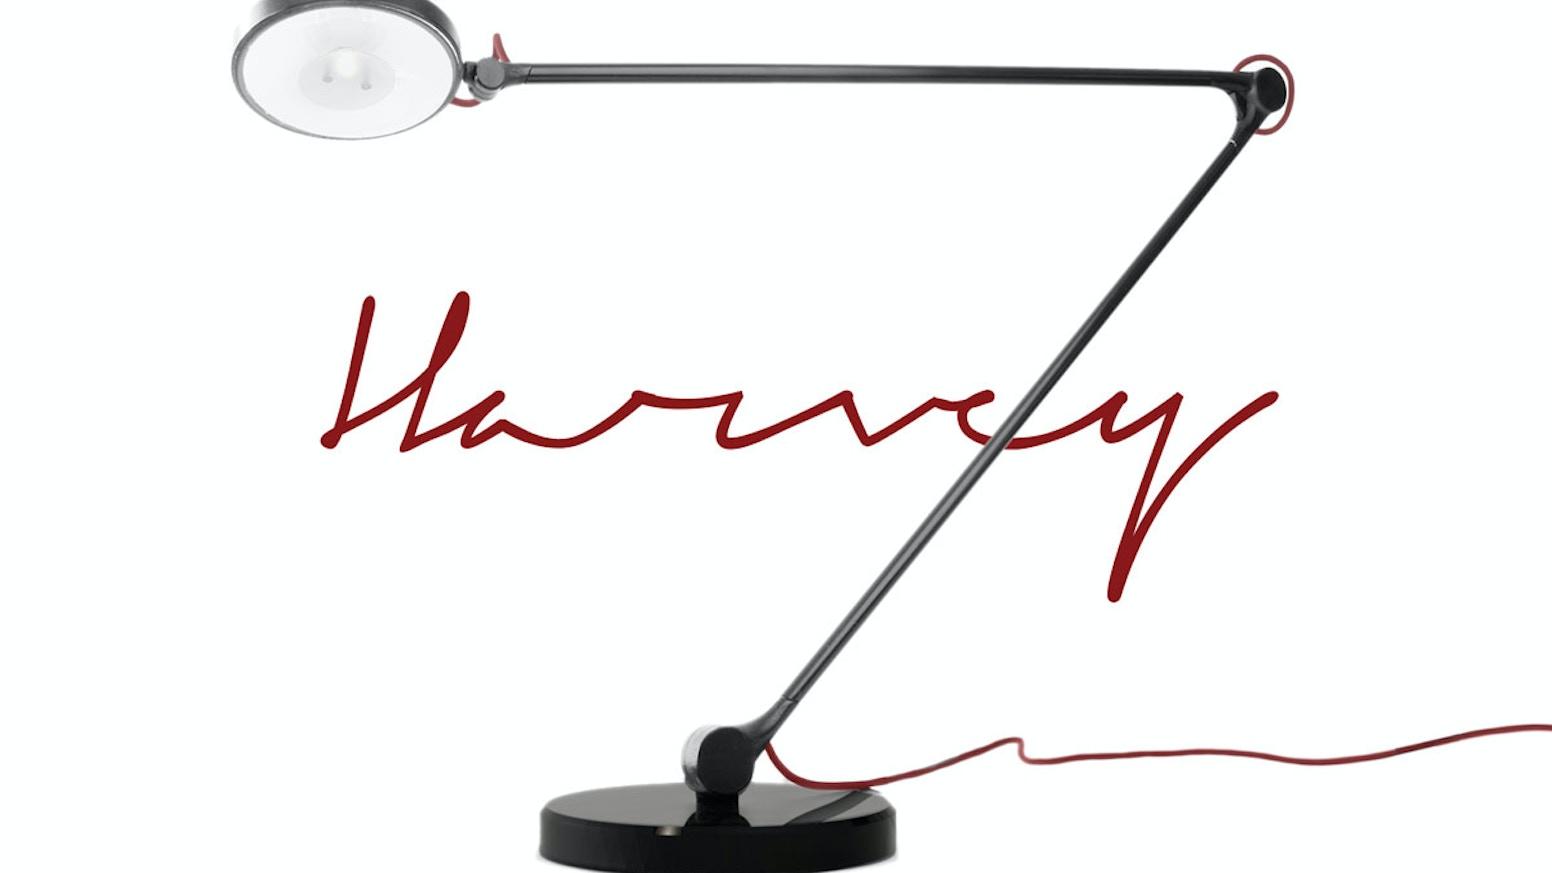 Harvey LED task lamp by David Oxley — Kickstarter